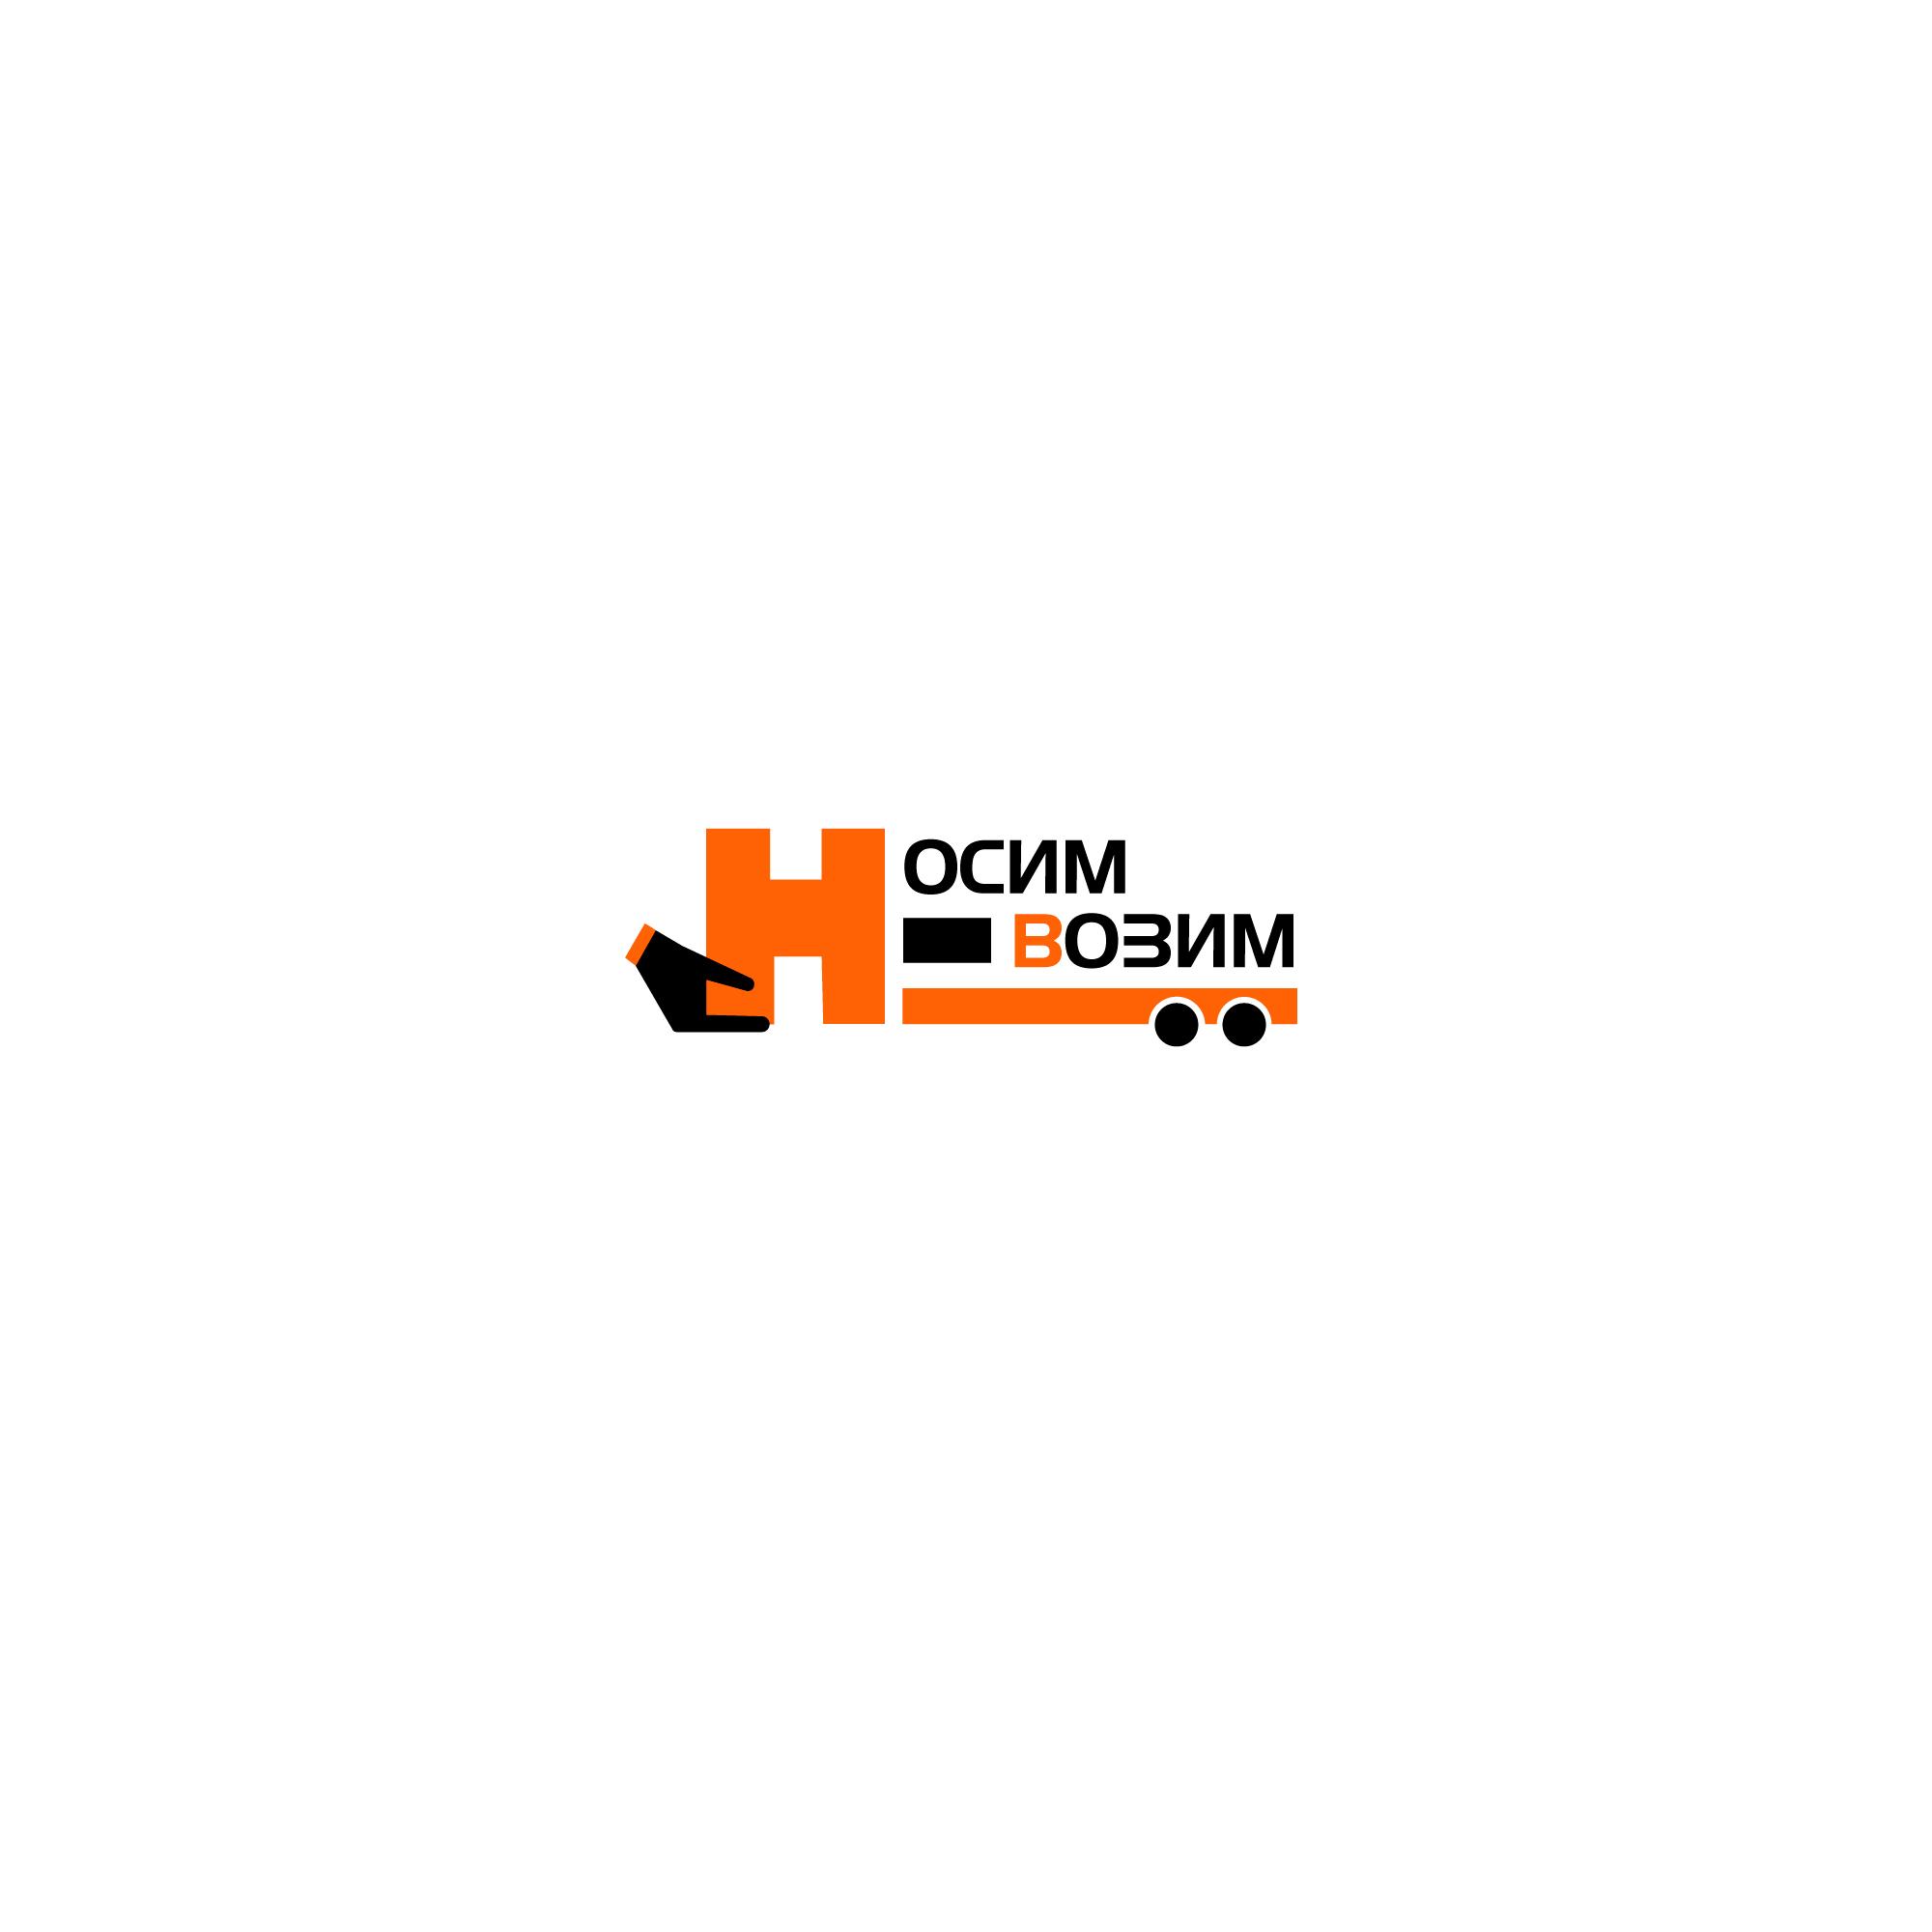 Логотип компании по перевозкам НосимВозим фото f_2095cf6a8cedf03e.jpg